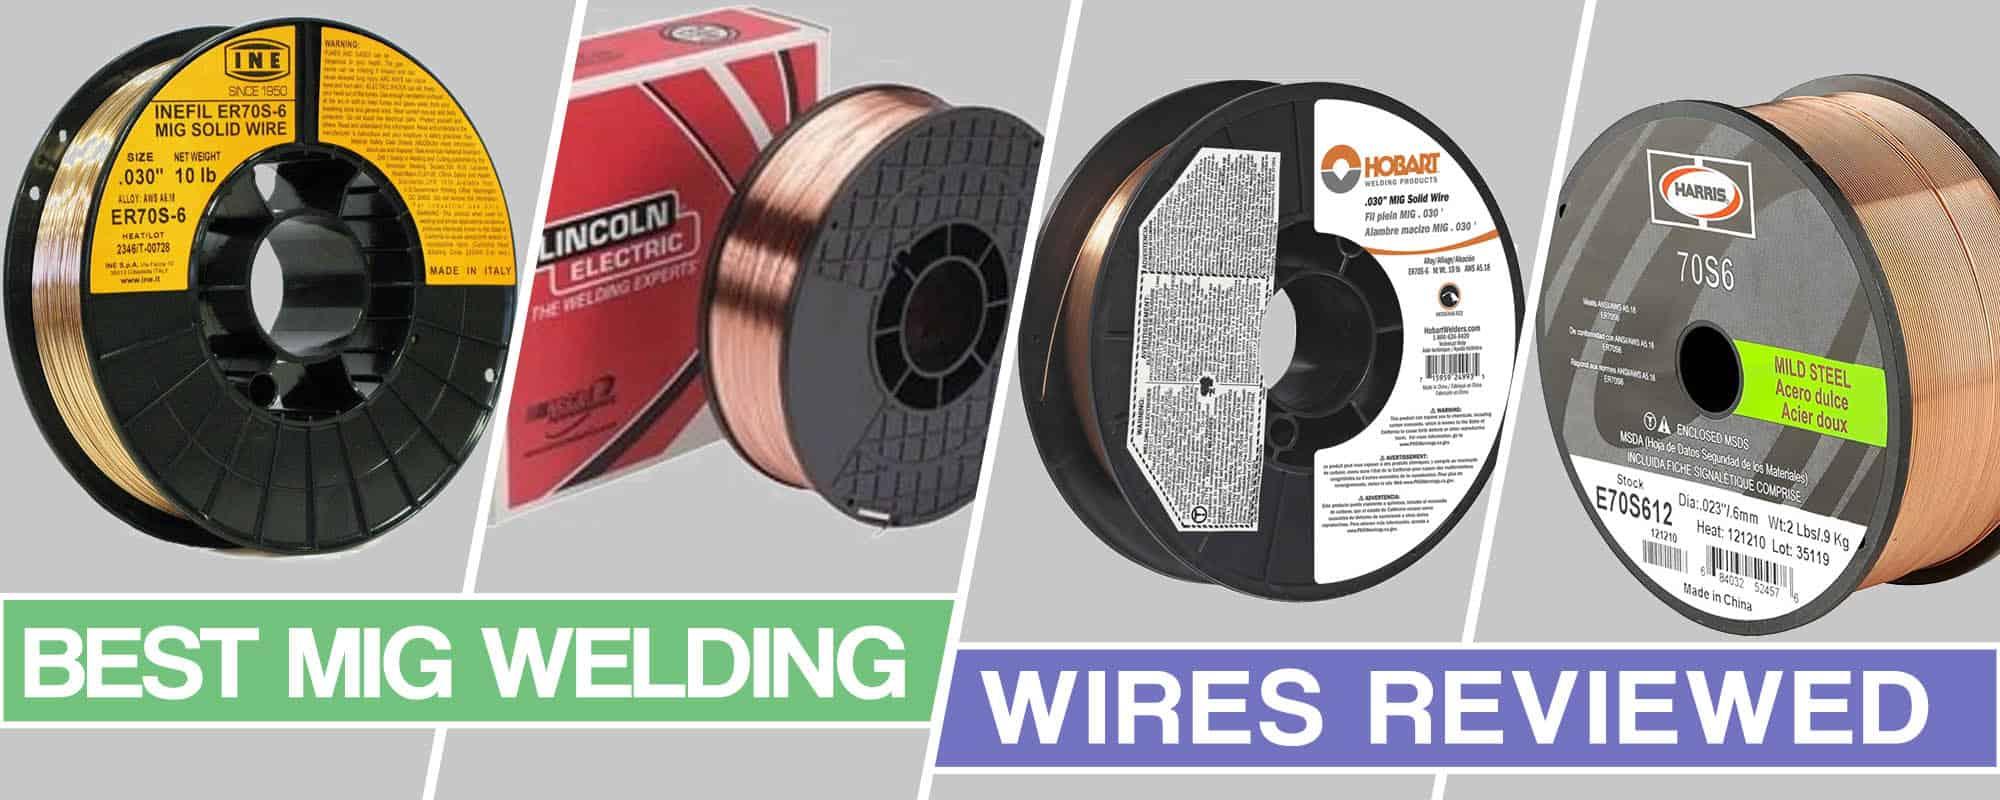 image of the best mig welding wires